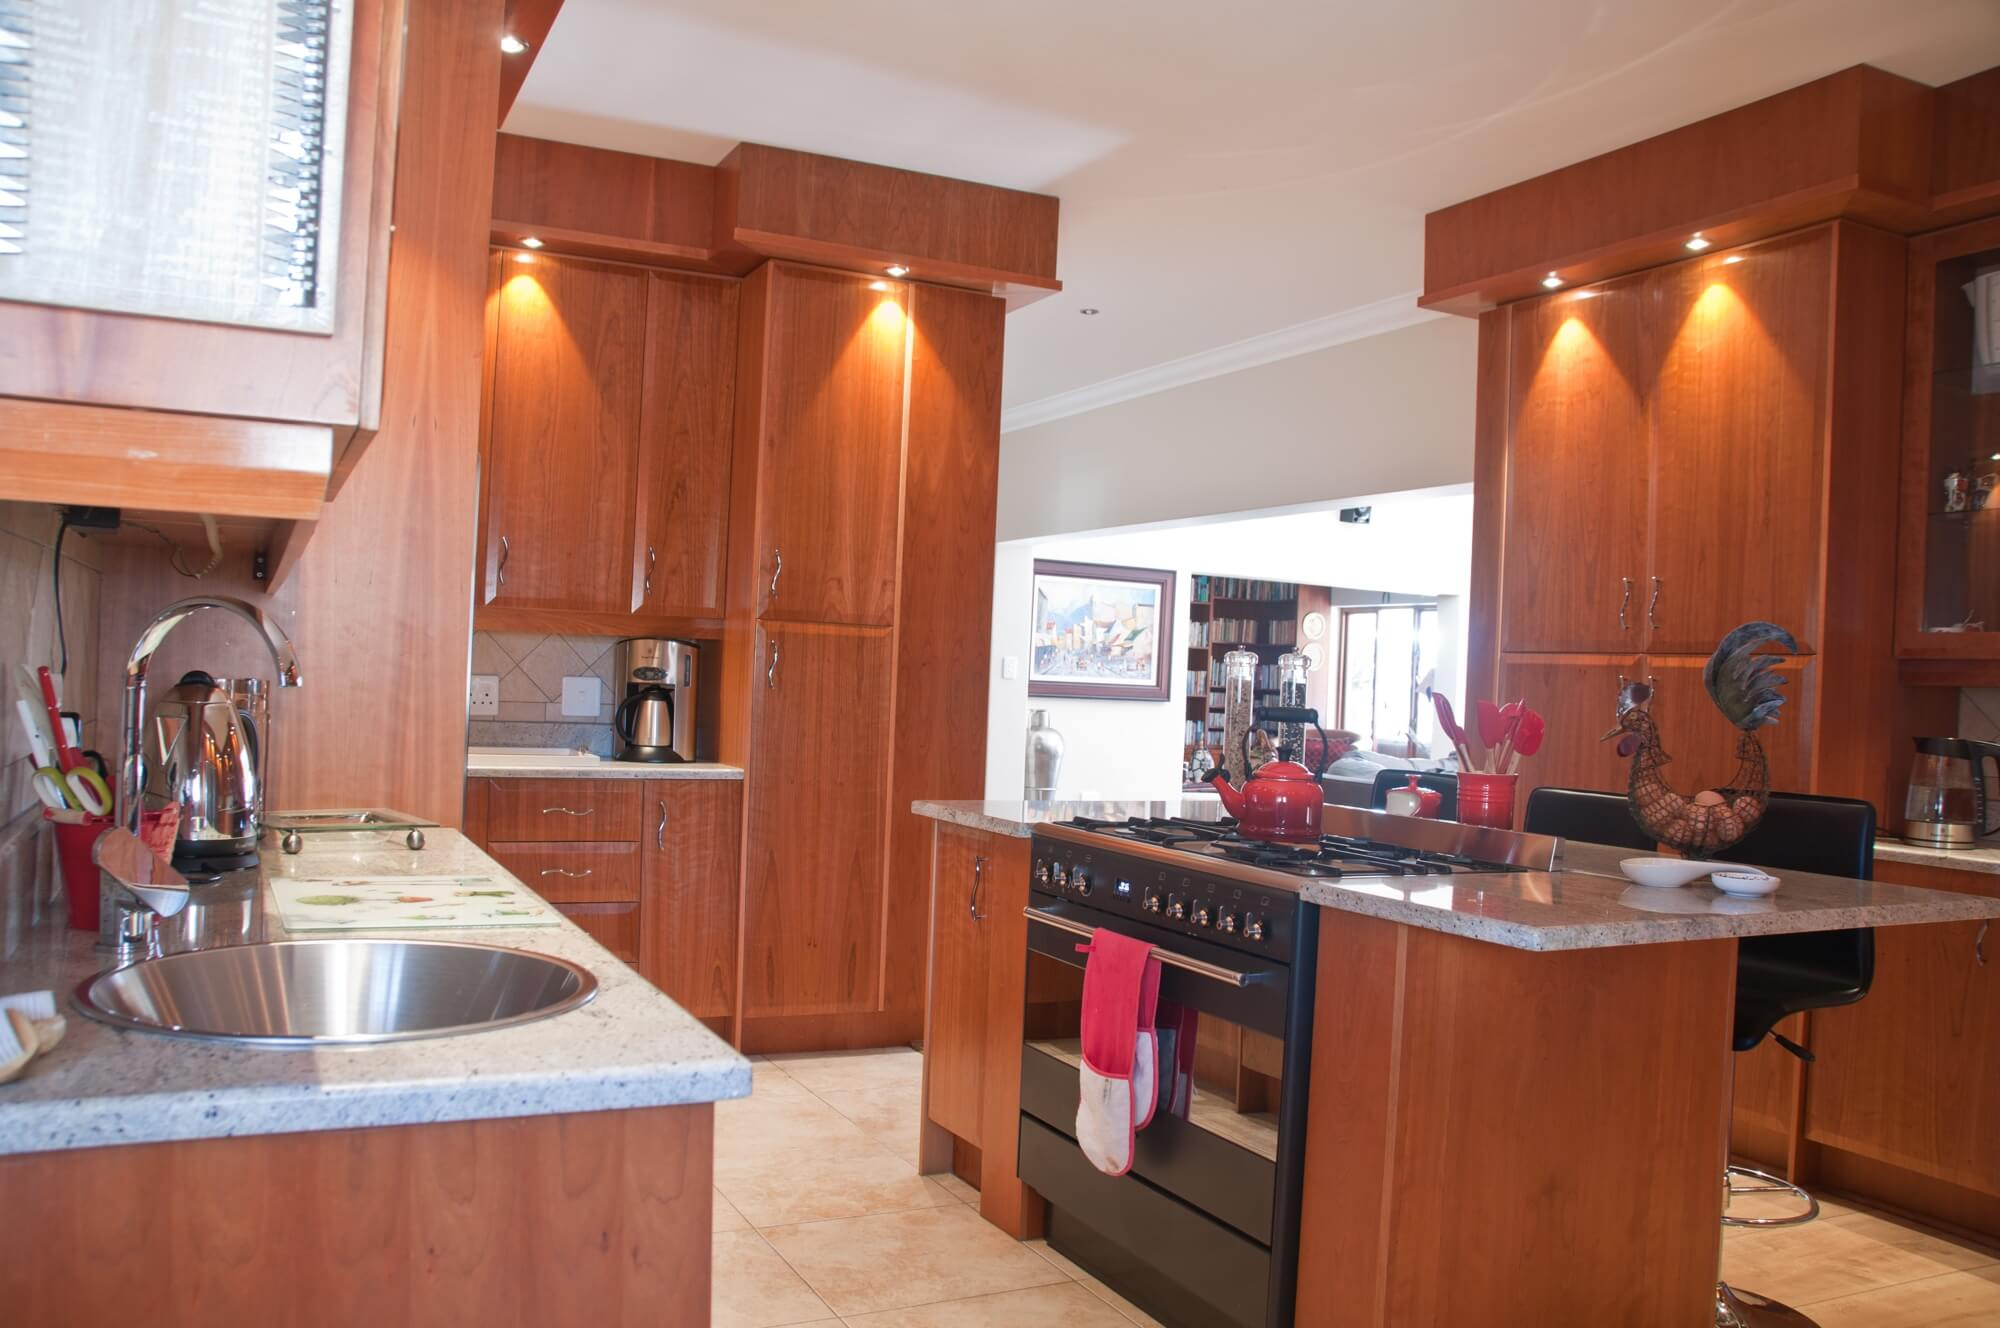 Gallery Kitchen Frontiers